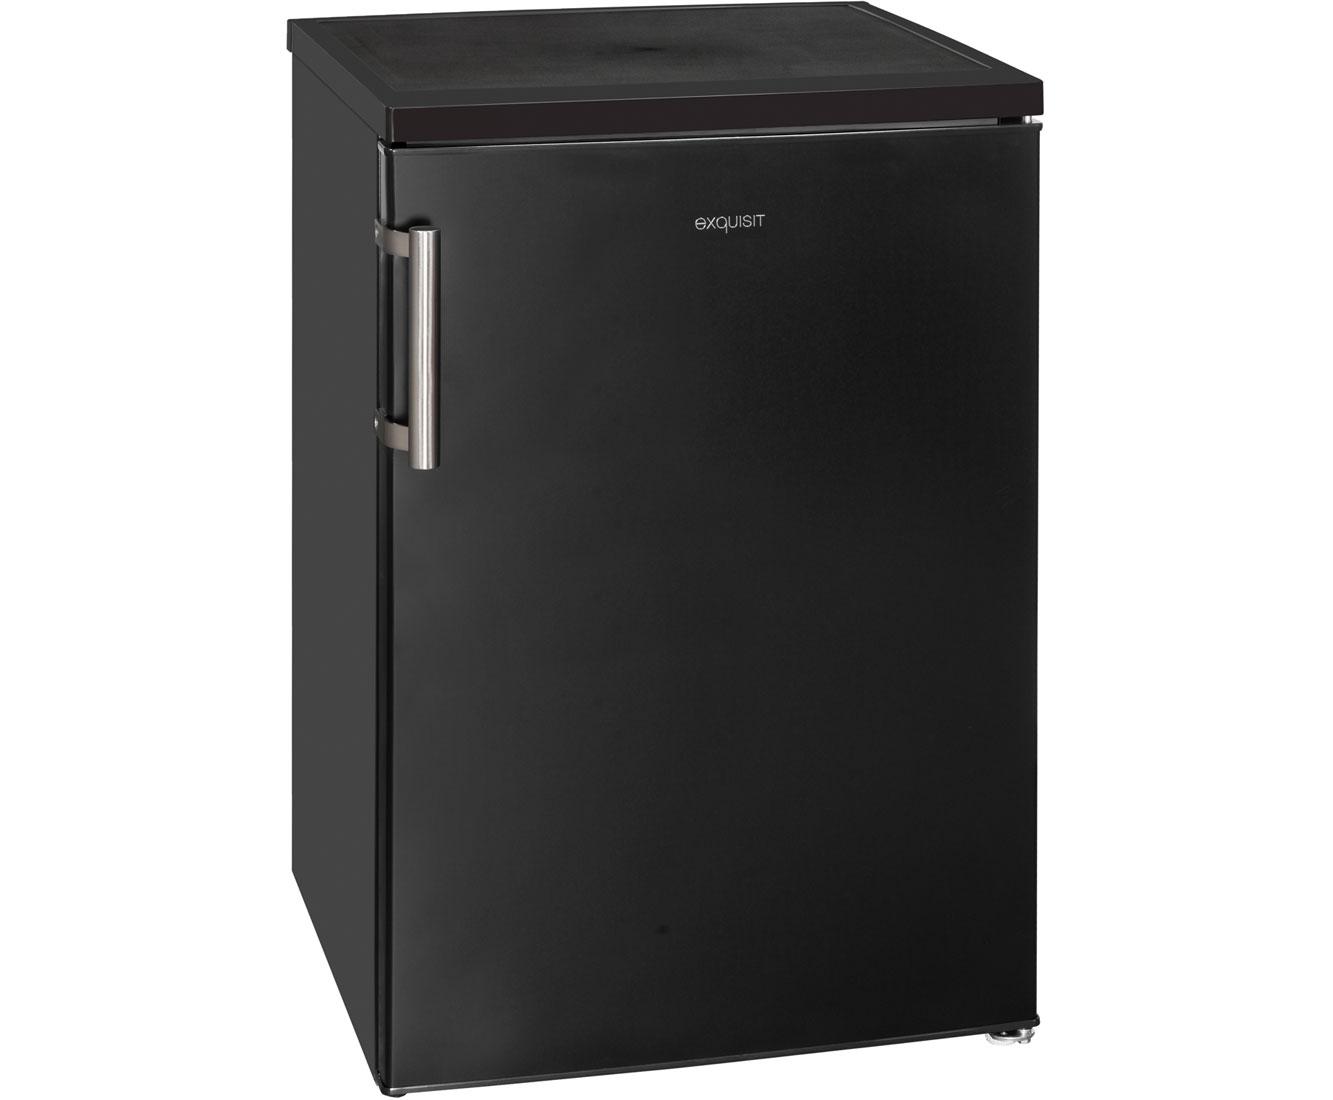 Exquisit Retro Kühlschrank : Exquisit ks rva kühlschrank matt schwarz a